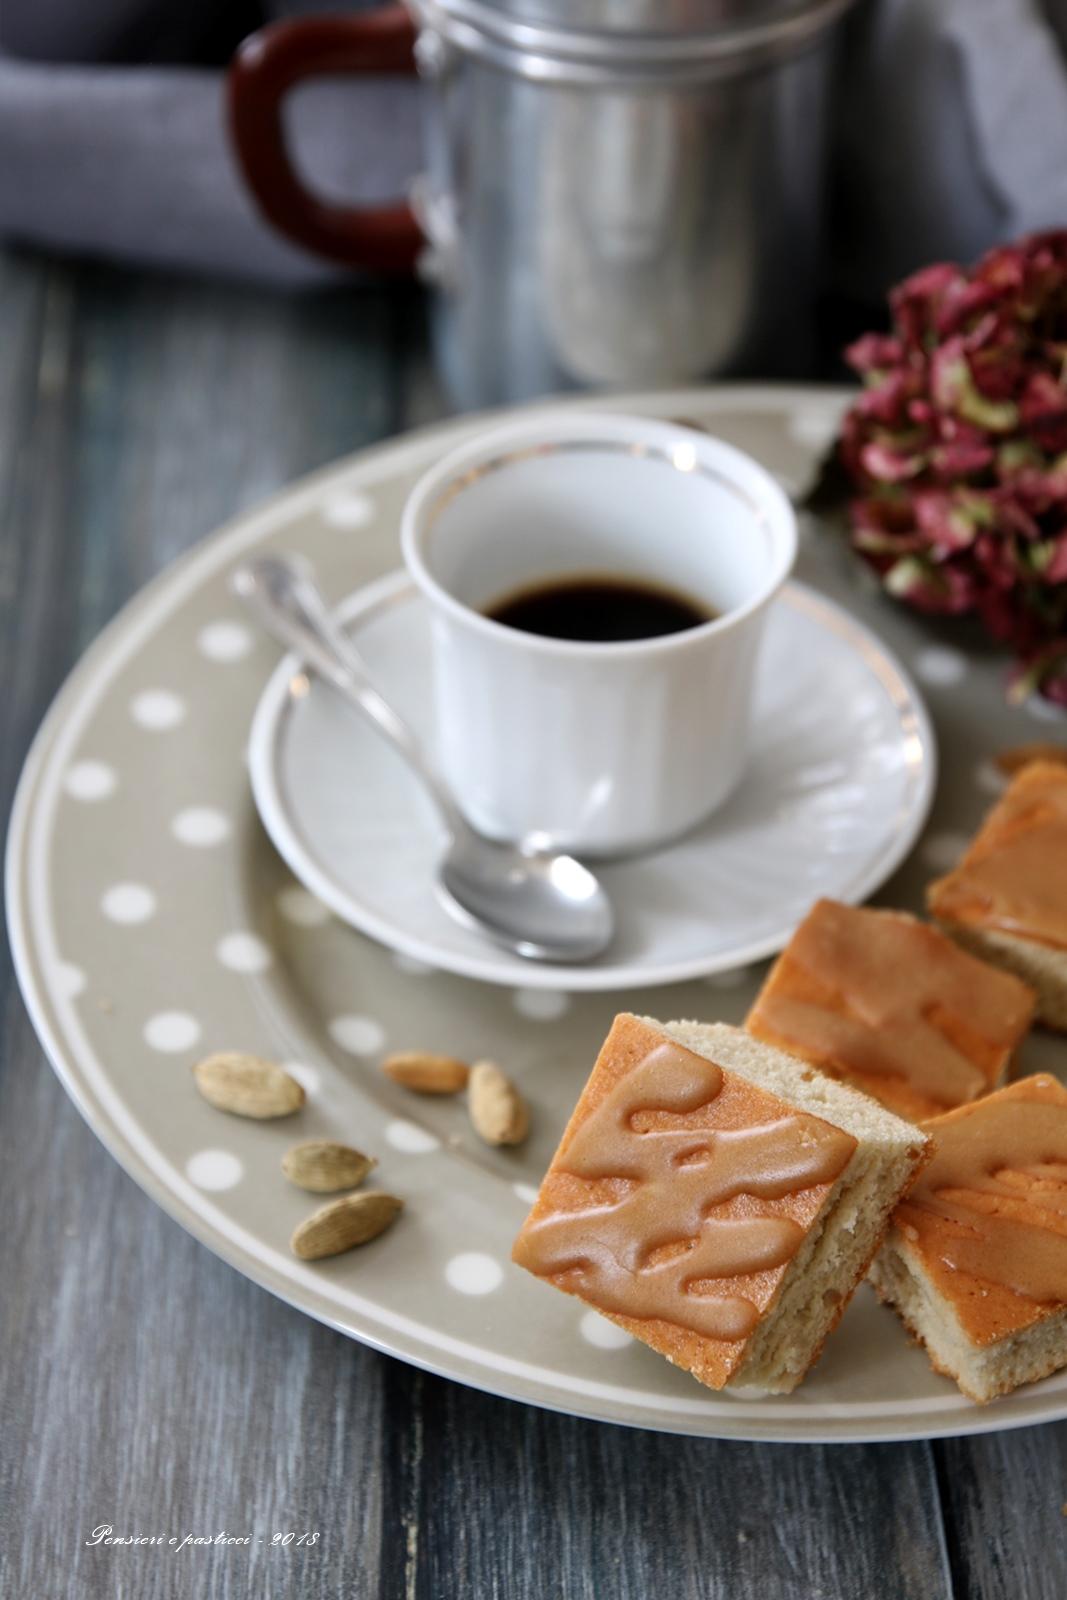 quadrotti soffici al chai glassati al caffè